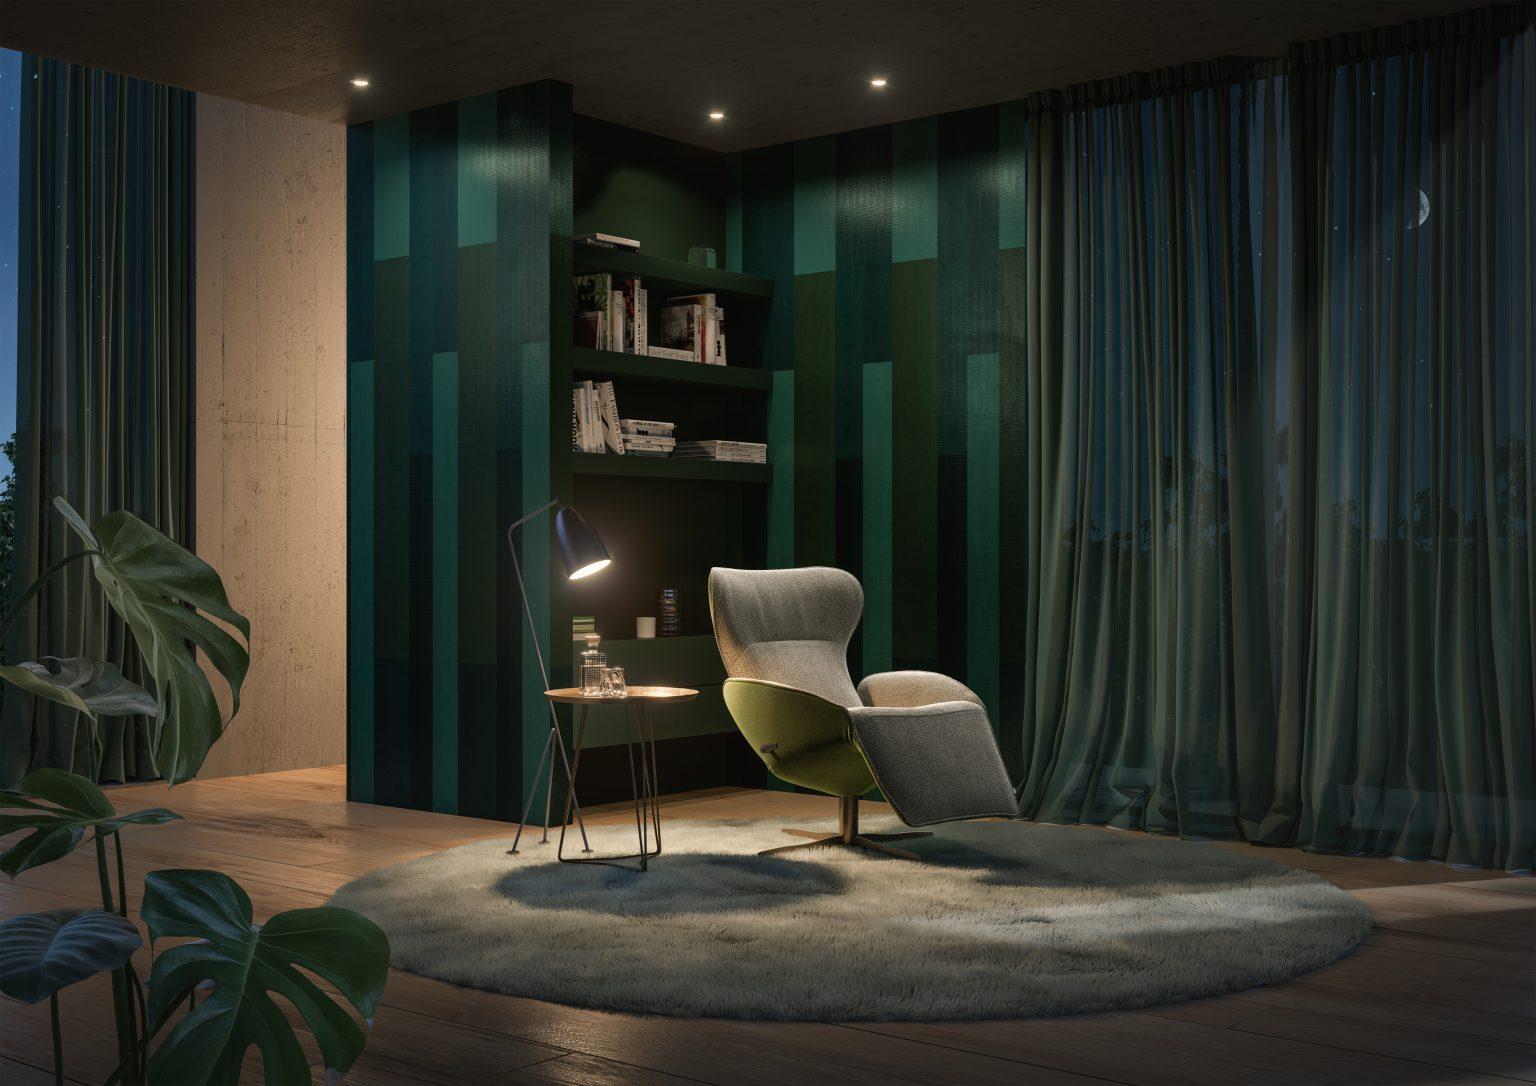 Biennale Interieur - Belgium's leading design and interior event - Daydreamer1.jpg